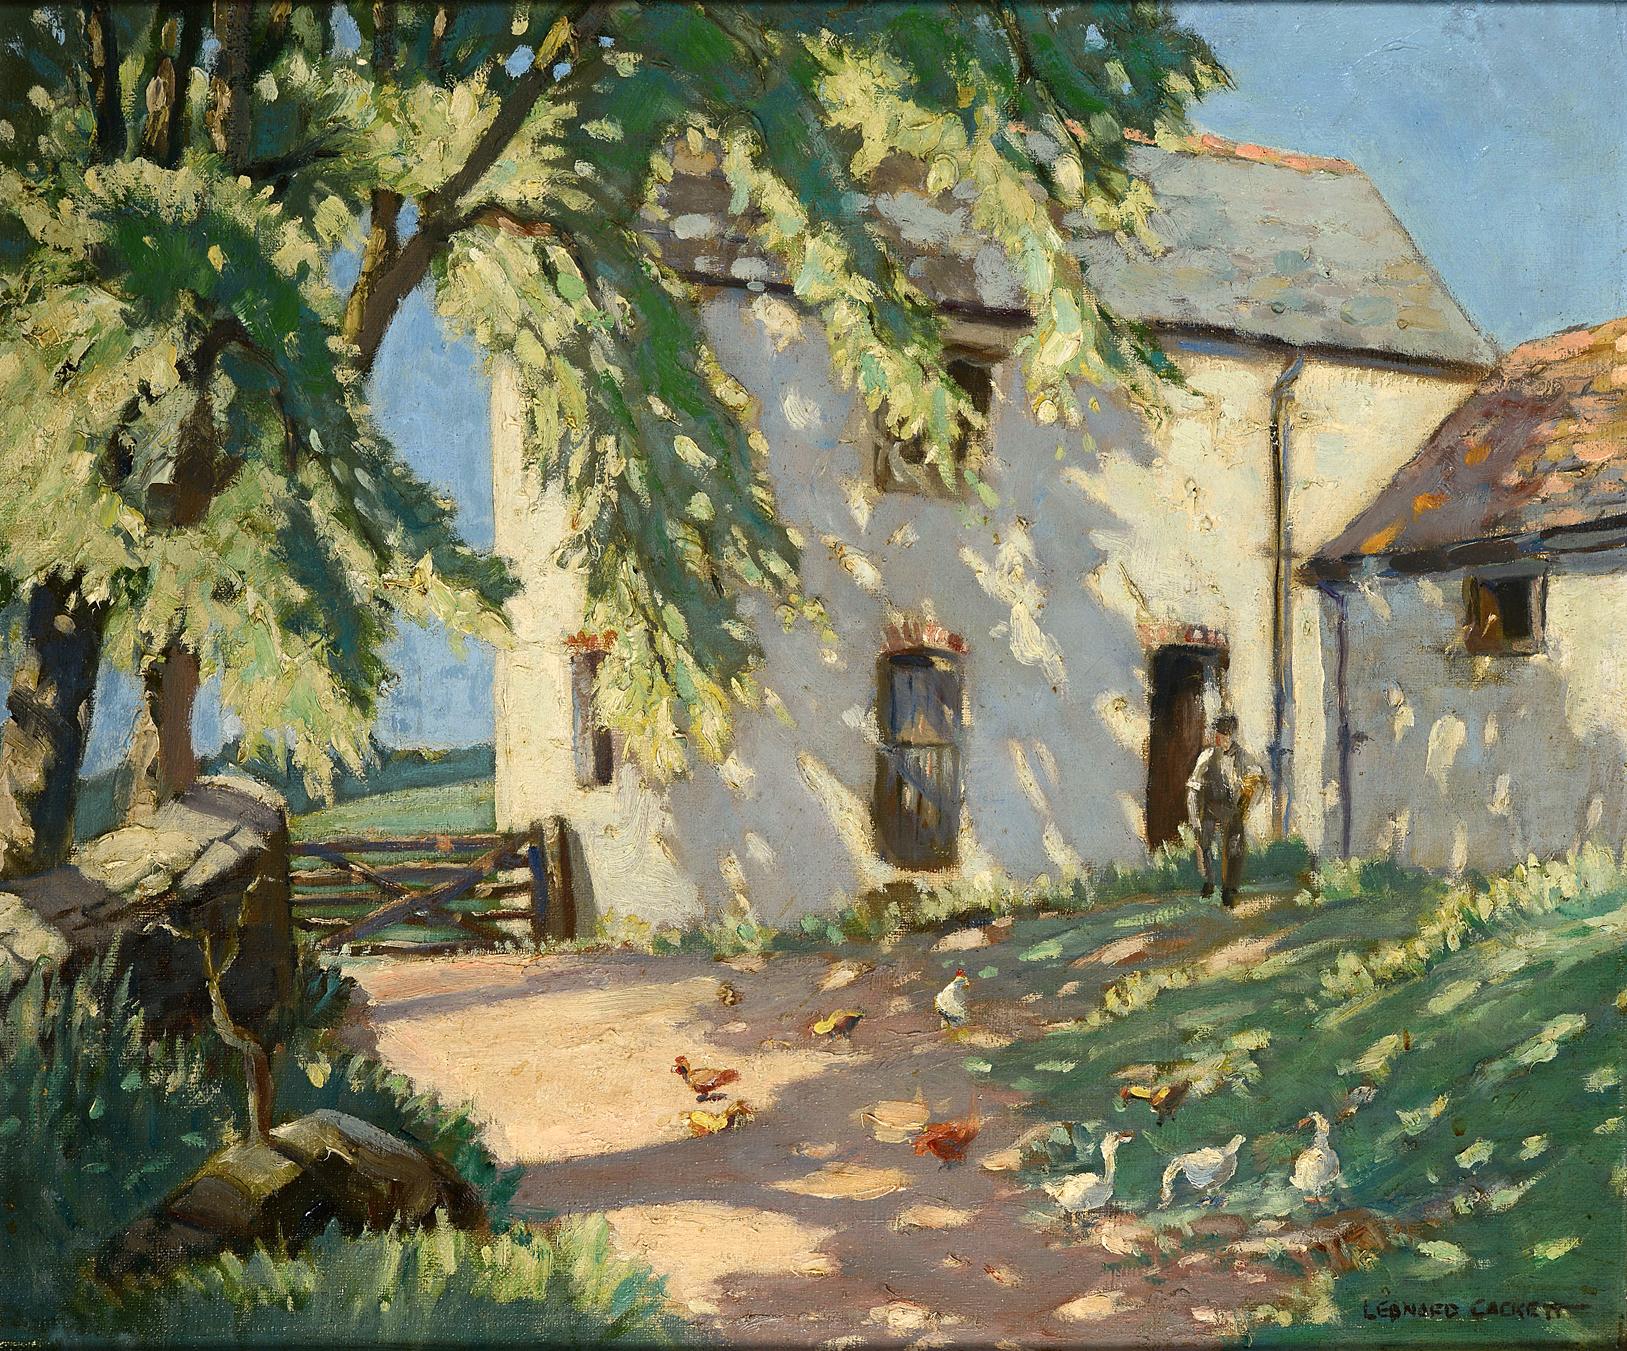 CACKETT LEONARD Babbington Fine Art